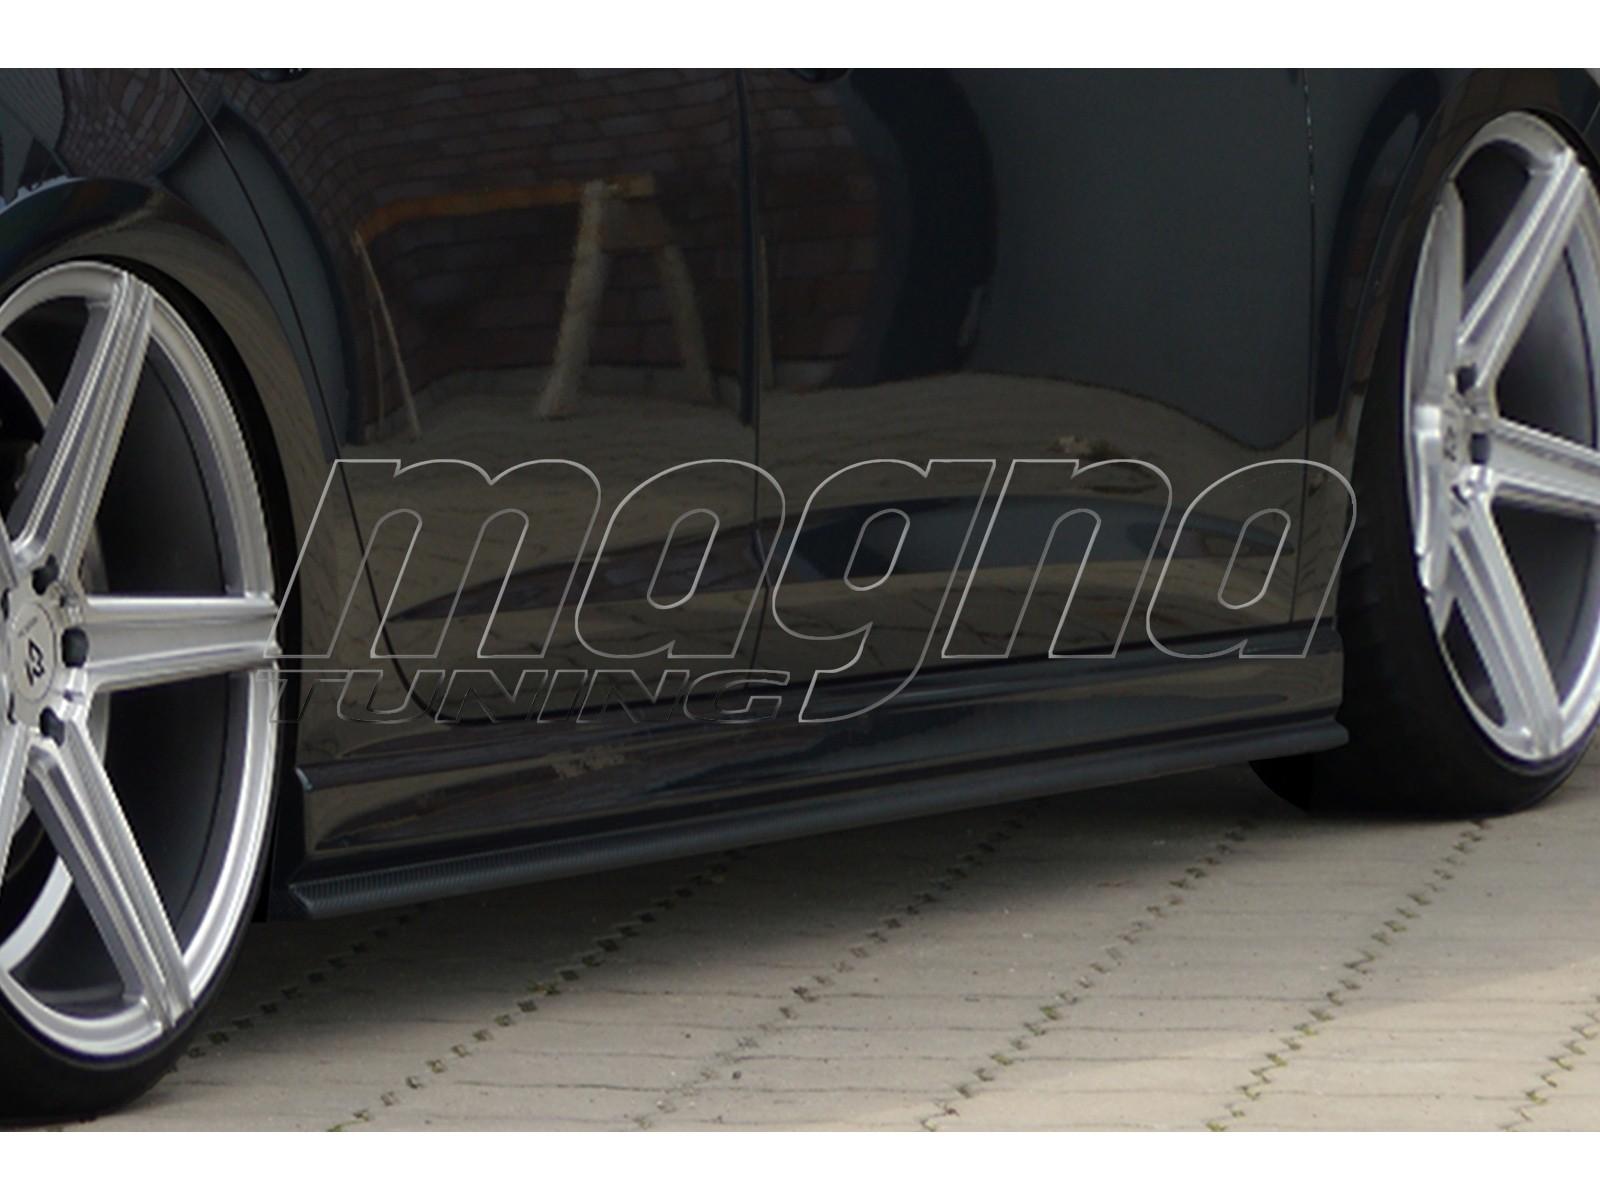 VW Touran MK2 Invido Side Skirts